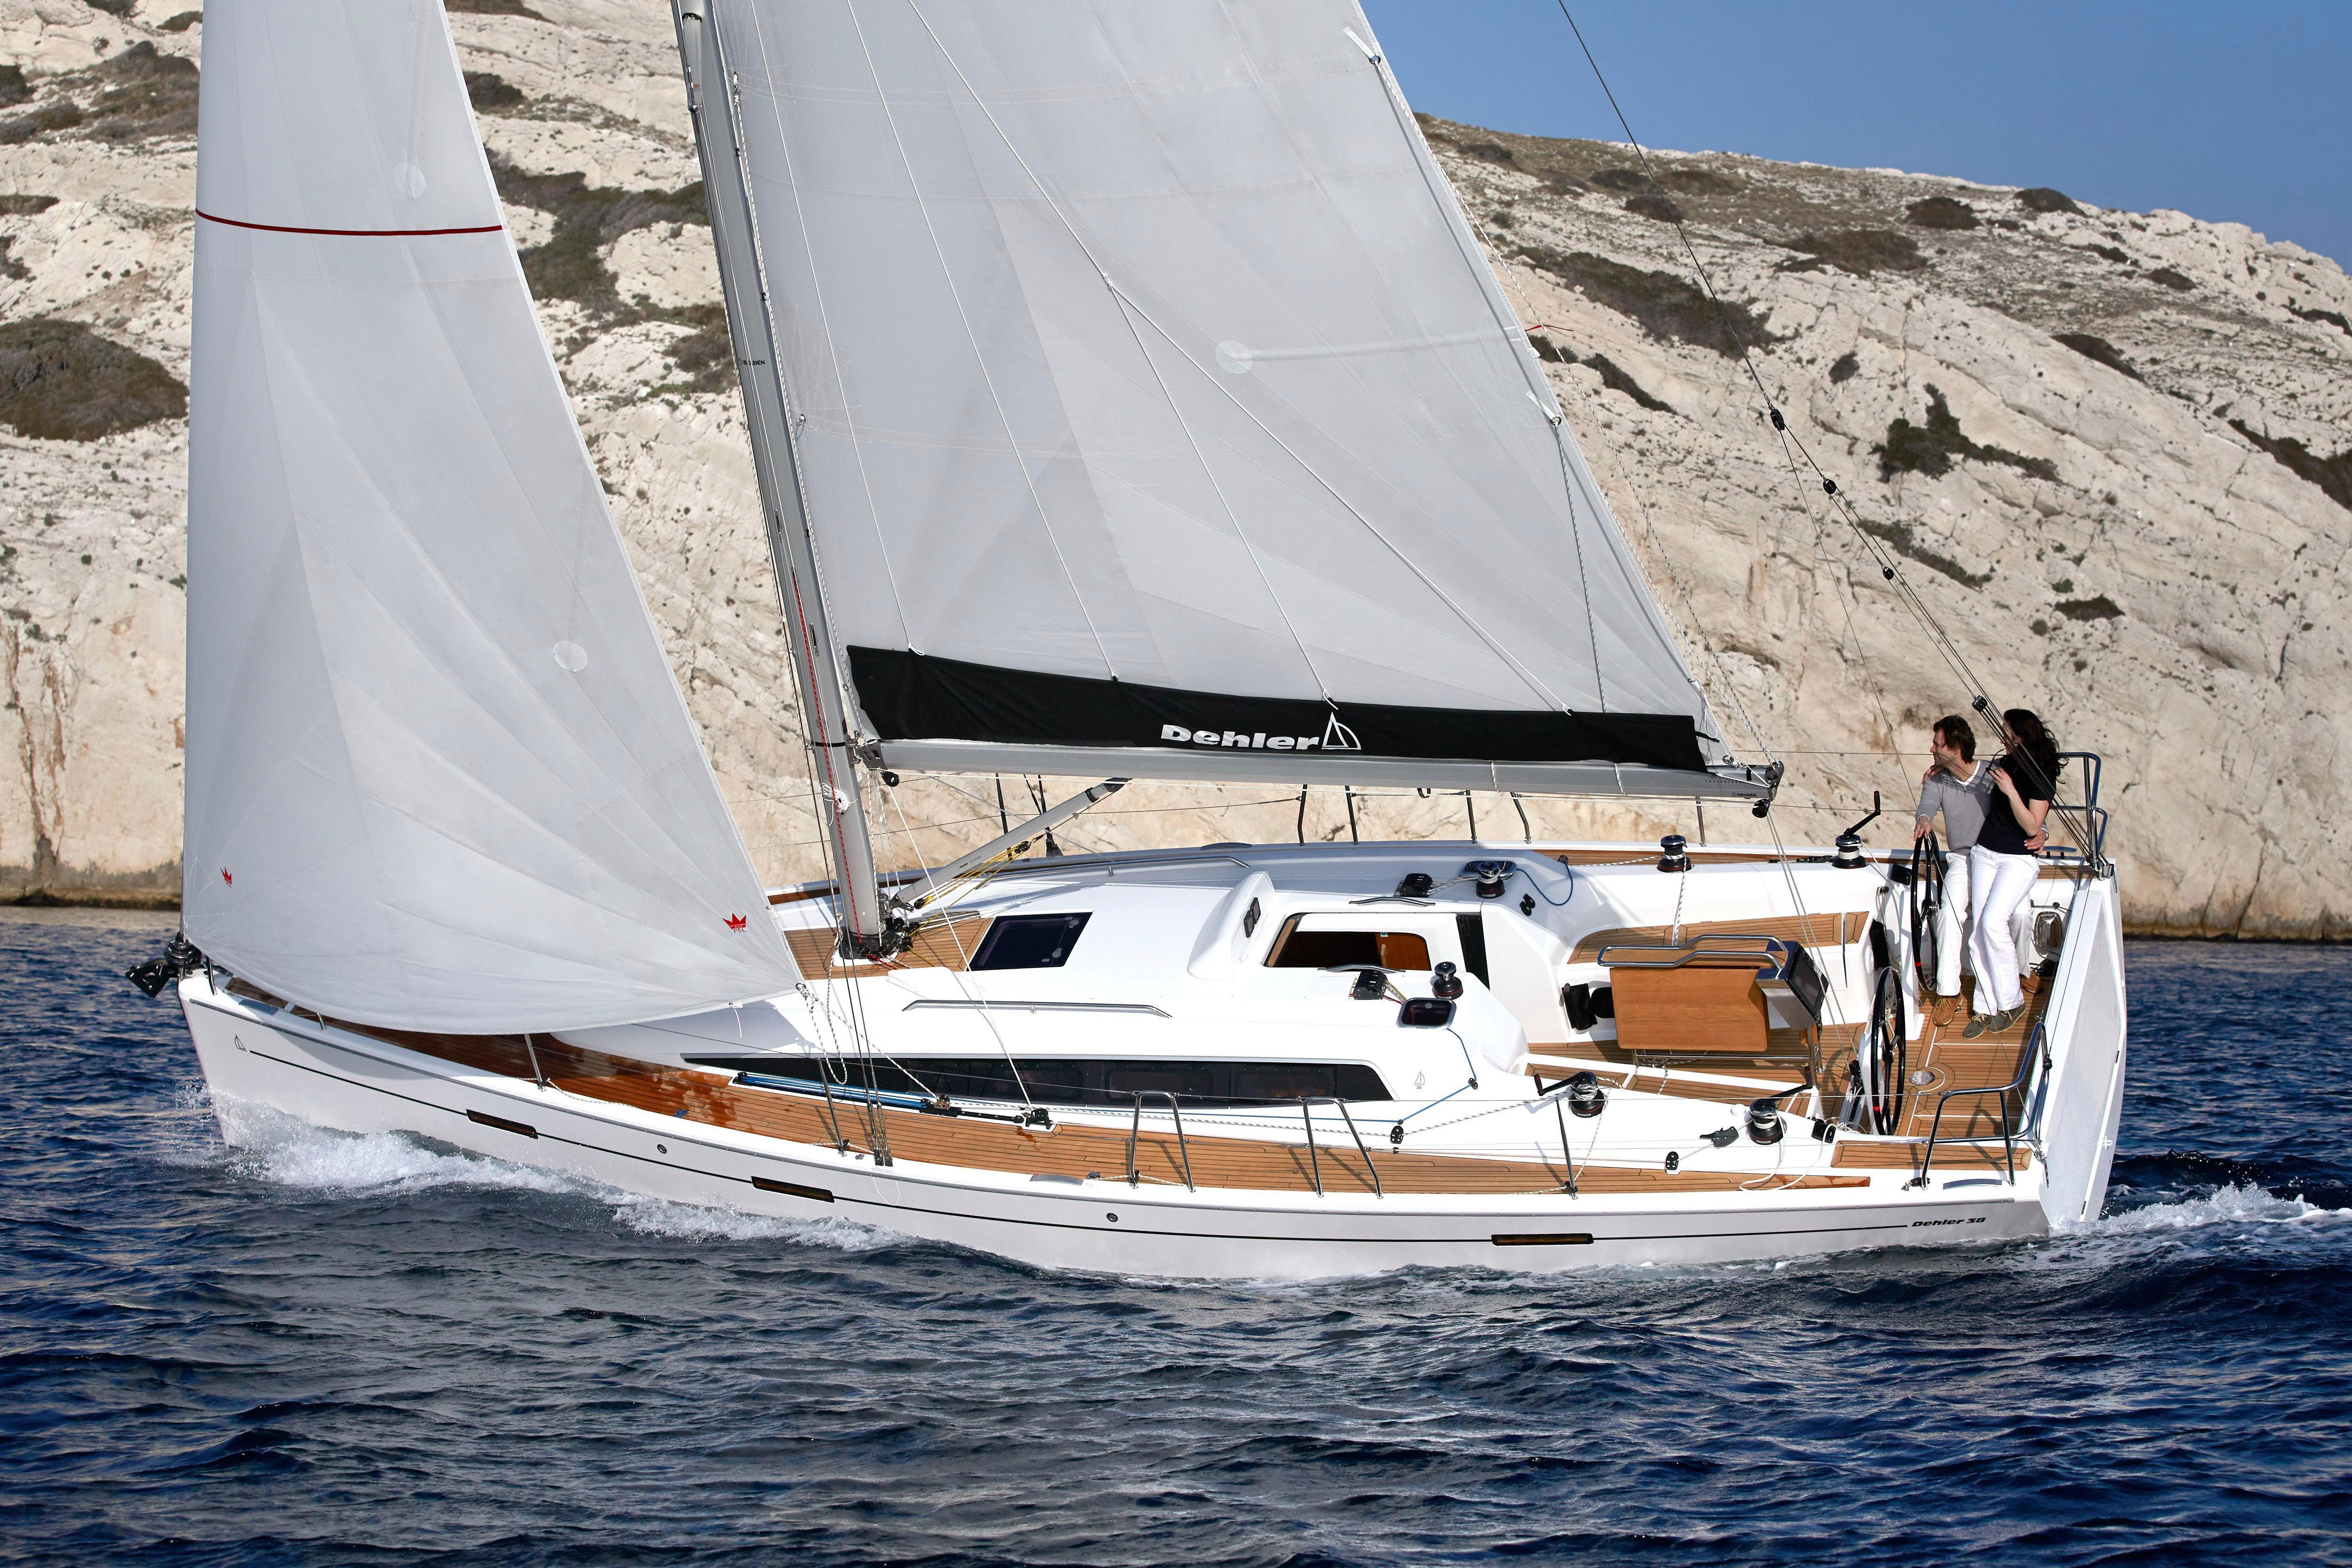 New Dehler 38 Racer and Cruiser Sailboat For Sale